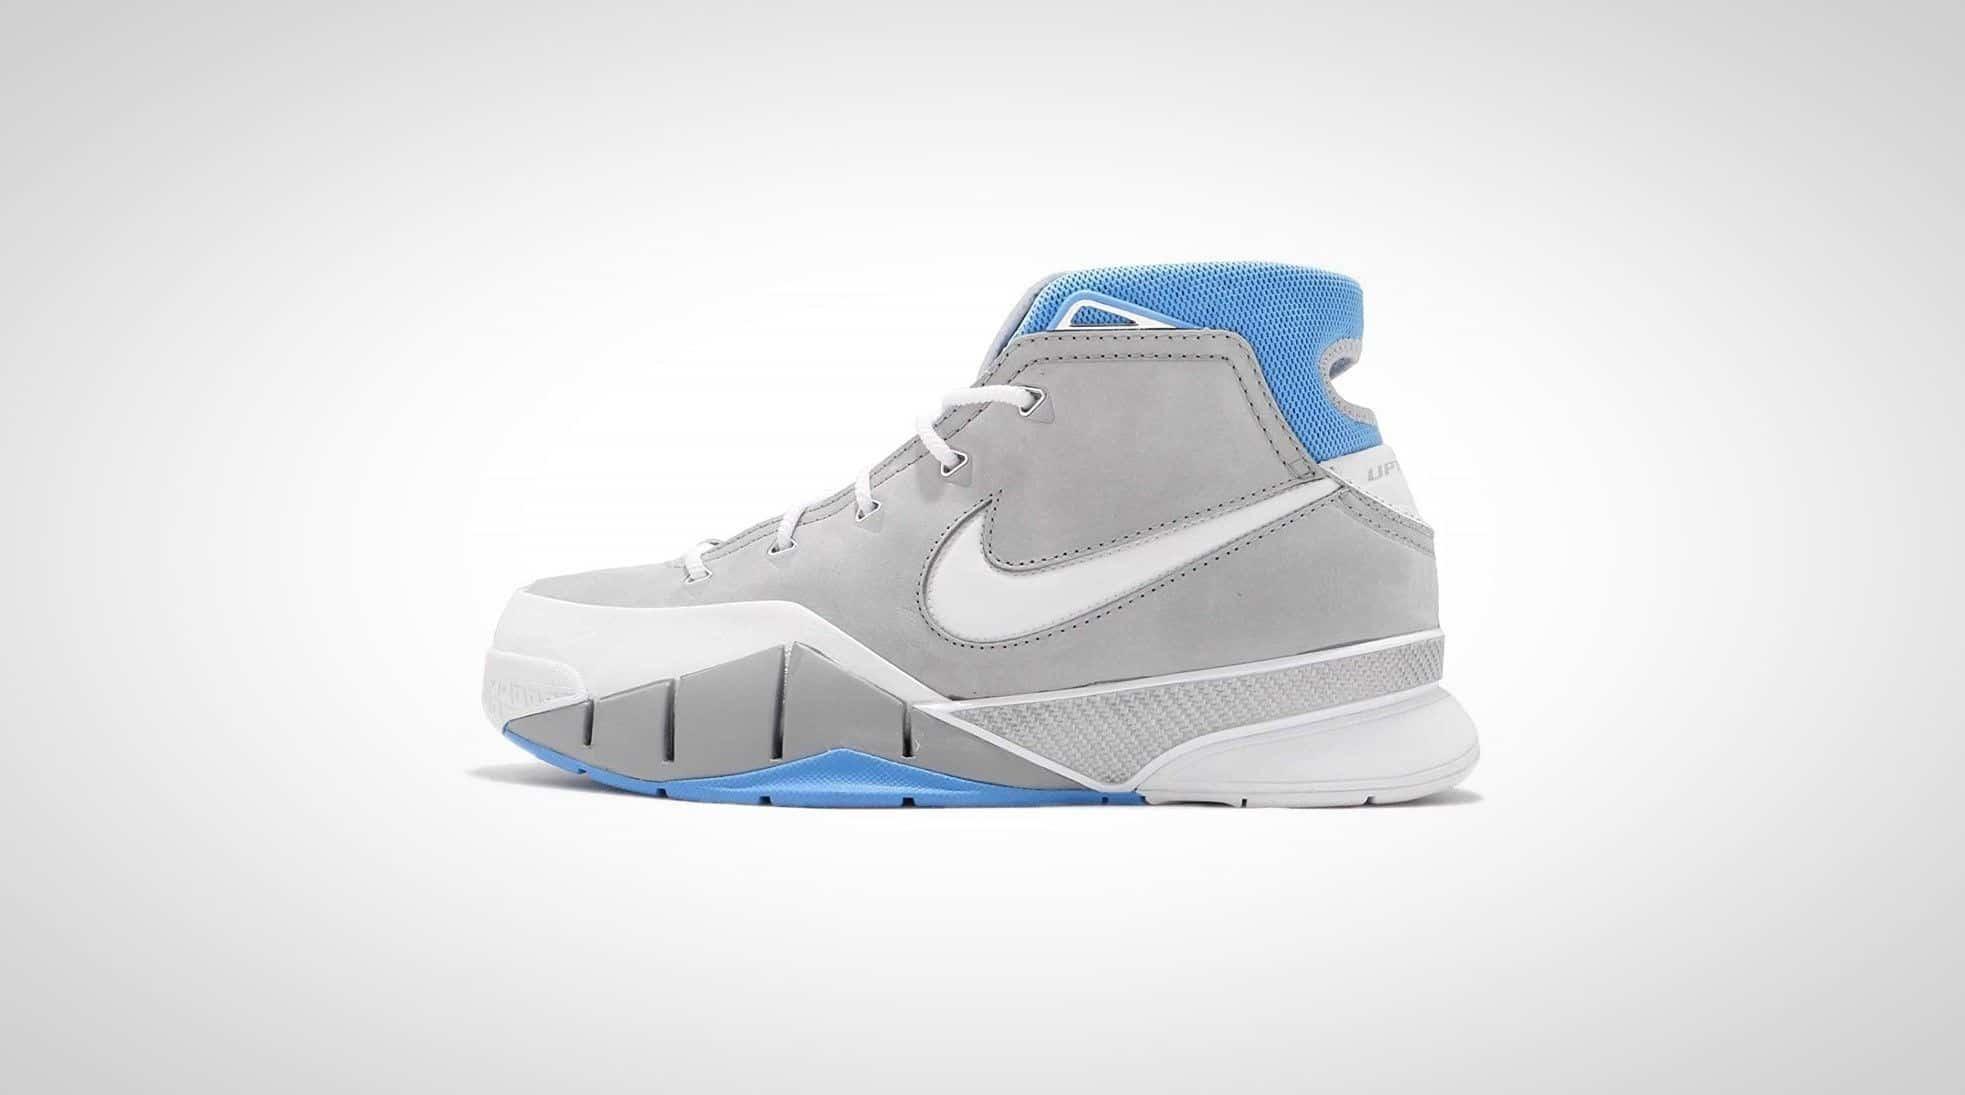 b40aeda5d3bb Nike Kobe 1 Protro Shoe Review - BestOutdoorBasketball